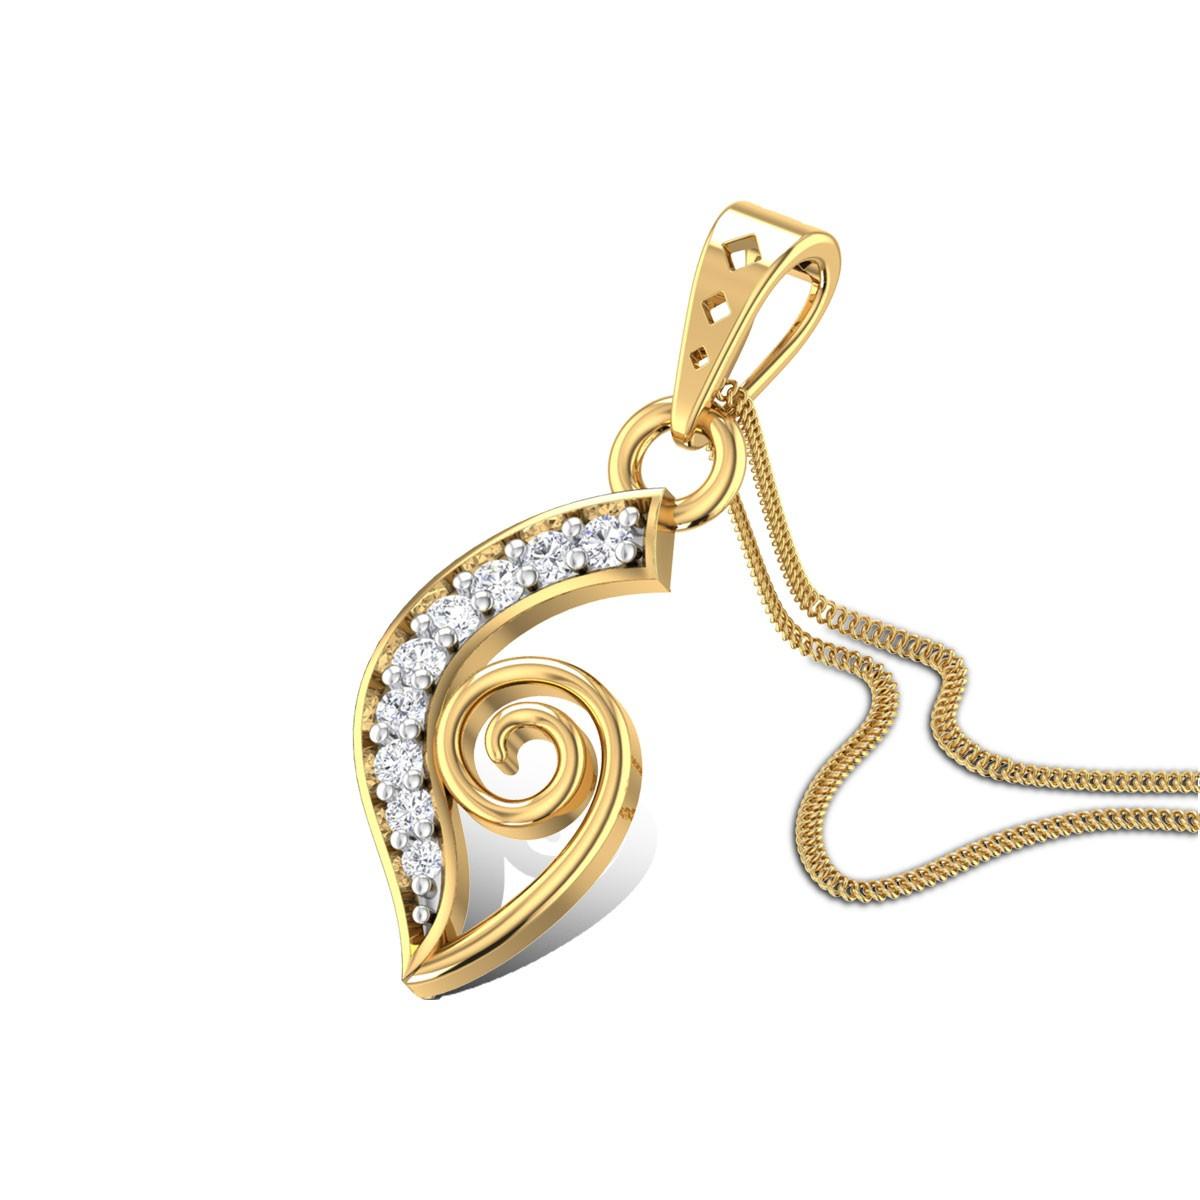 Tranqulity Diamond Pendant